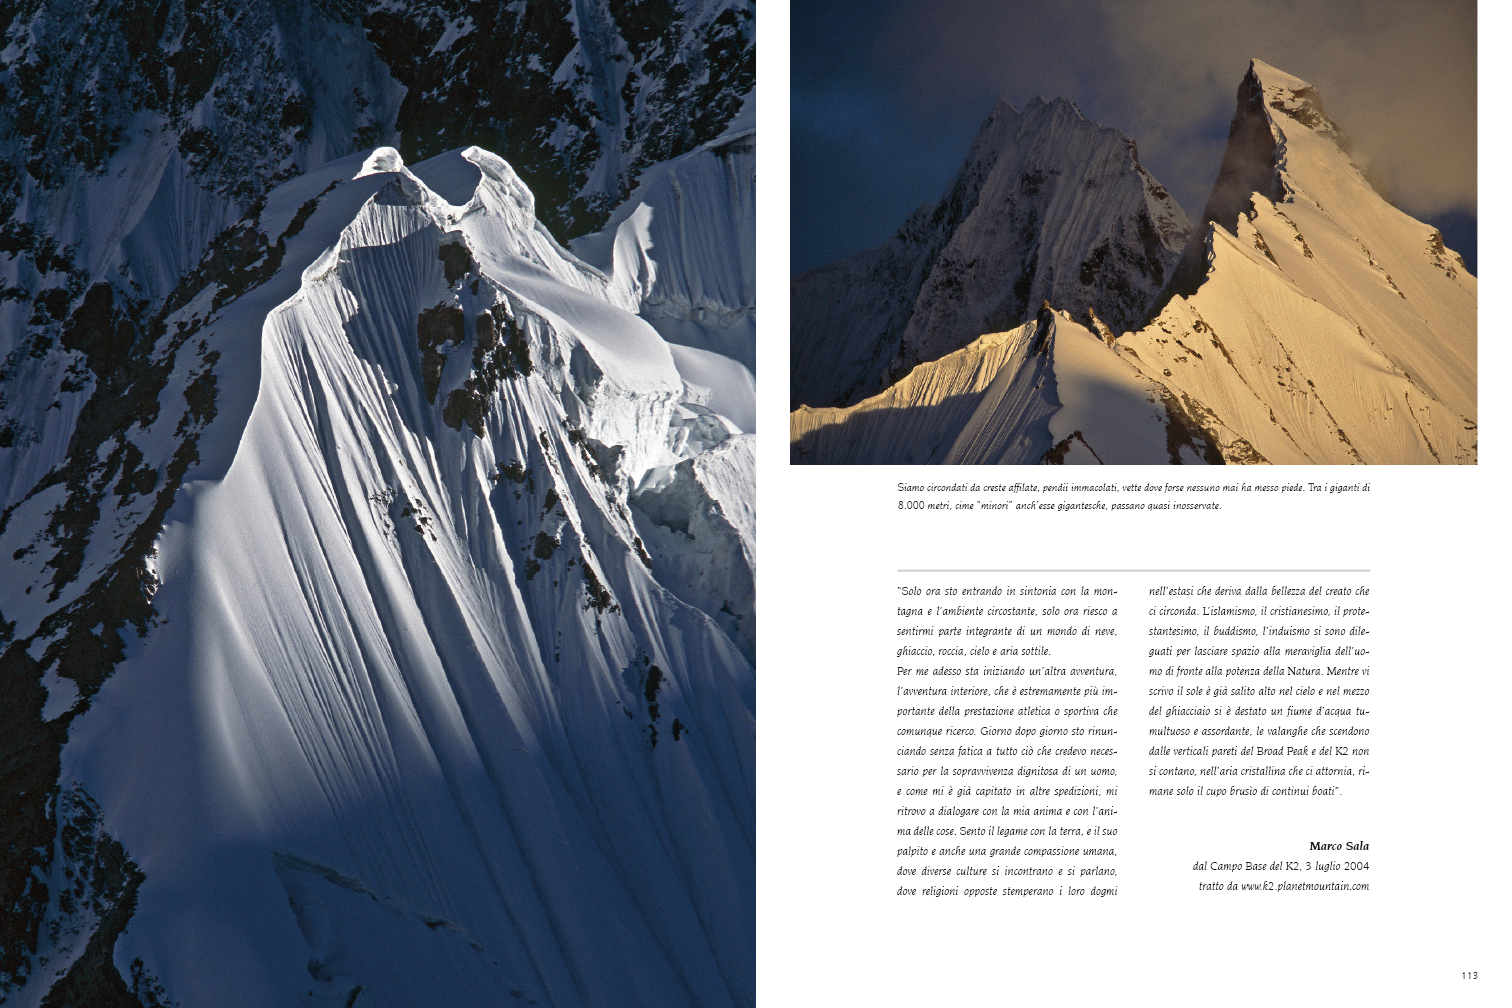 K2 EXPEDITION 1954-2004 Giuseppe Ghedina Fotografo - 058.jpg